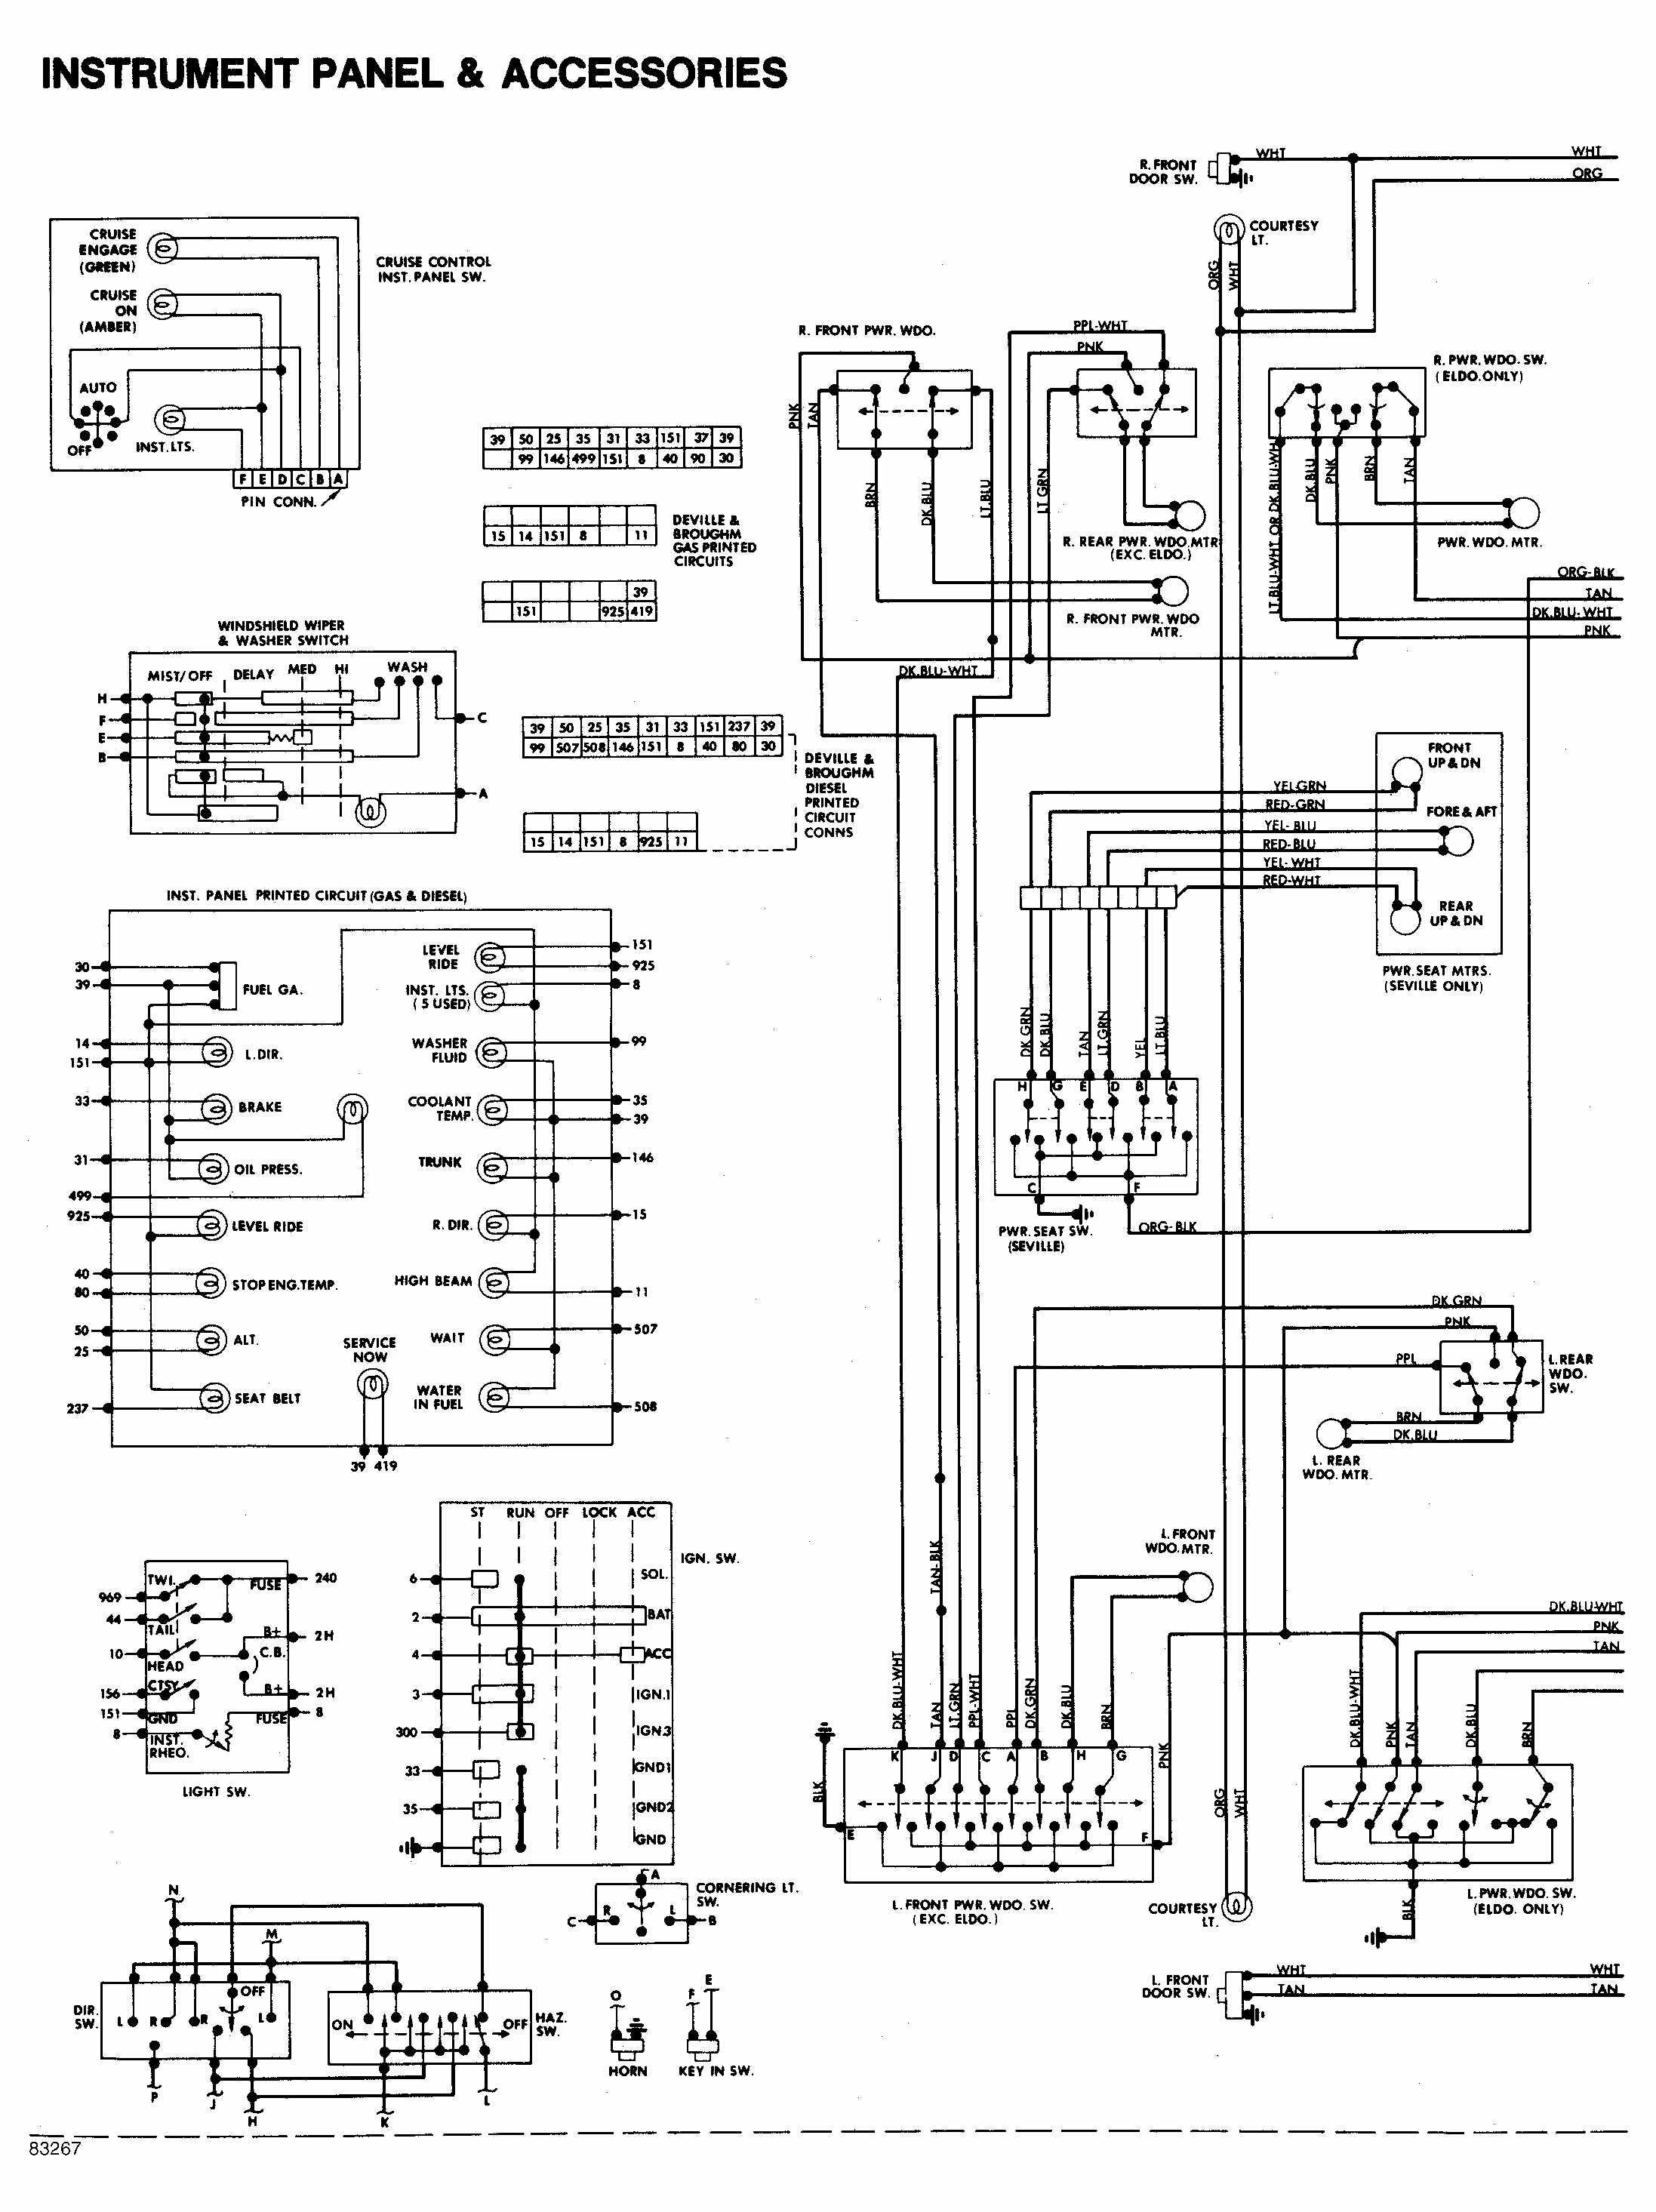 Cadillac Escalade Stereo Wiring Diagram on 1999 cadillac seville wiring diagram, 2002 cadillac escalade parts manual, 2002 cadillac escalade shop manual, 1966 chevrolet impala wiring diagram, 2003 cadillac seville wiring diagram, 2005 cadillac escalade wiring diagram, 2006 cadillac sts wiring diagram, 1998 cadillac seville wiring diagram, 1999 bmw 328i wiring diagram, 1999 cadillac escalade wiring diagram, 2002 cadillac escalade repair manual, 2007 cadillac dts wiring diagram, 2006 cadillac dts wiring diagram, 2000 cadillac escalade wiring diagram, 2005 cadillac srx wiring diagram, 2000 chevy blazer wiring diagram, 2008 cadillac escalade wiring diagram, 2002 cadillac escalade fuse box diagram, 2009 cadillac cts wiring diagram,